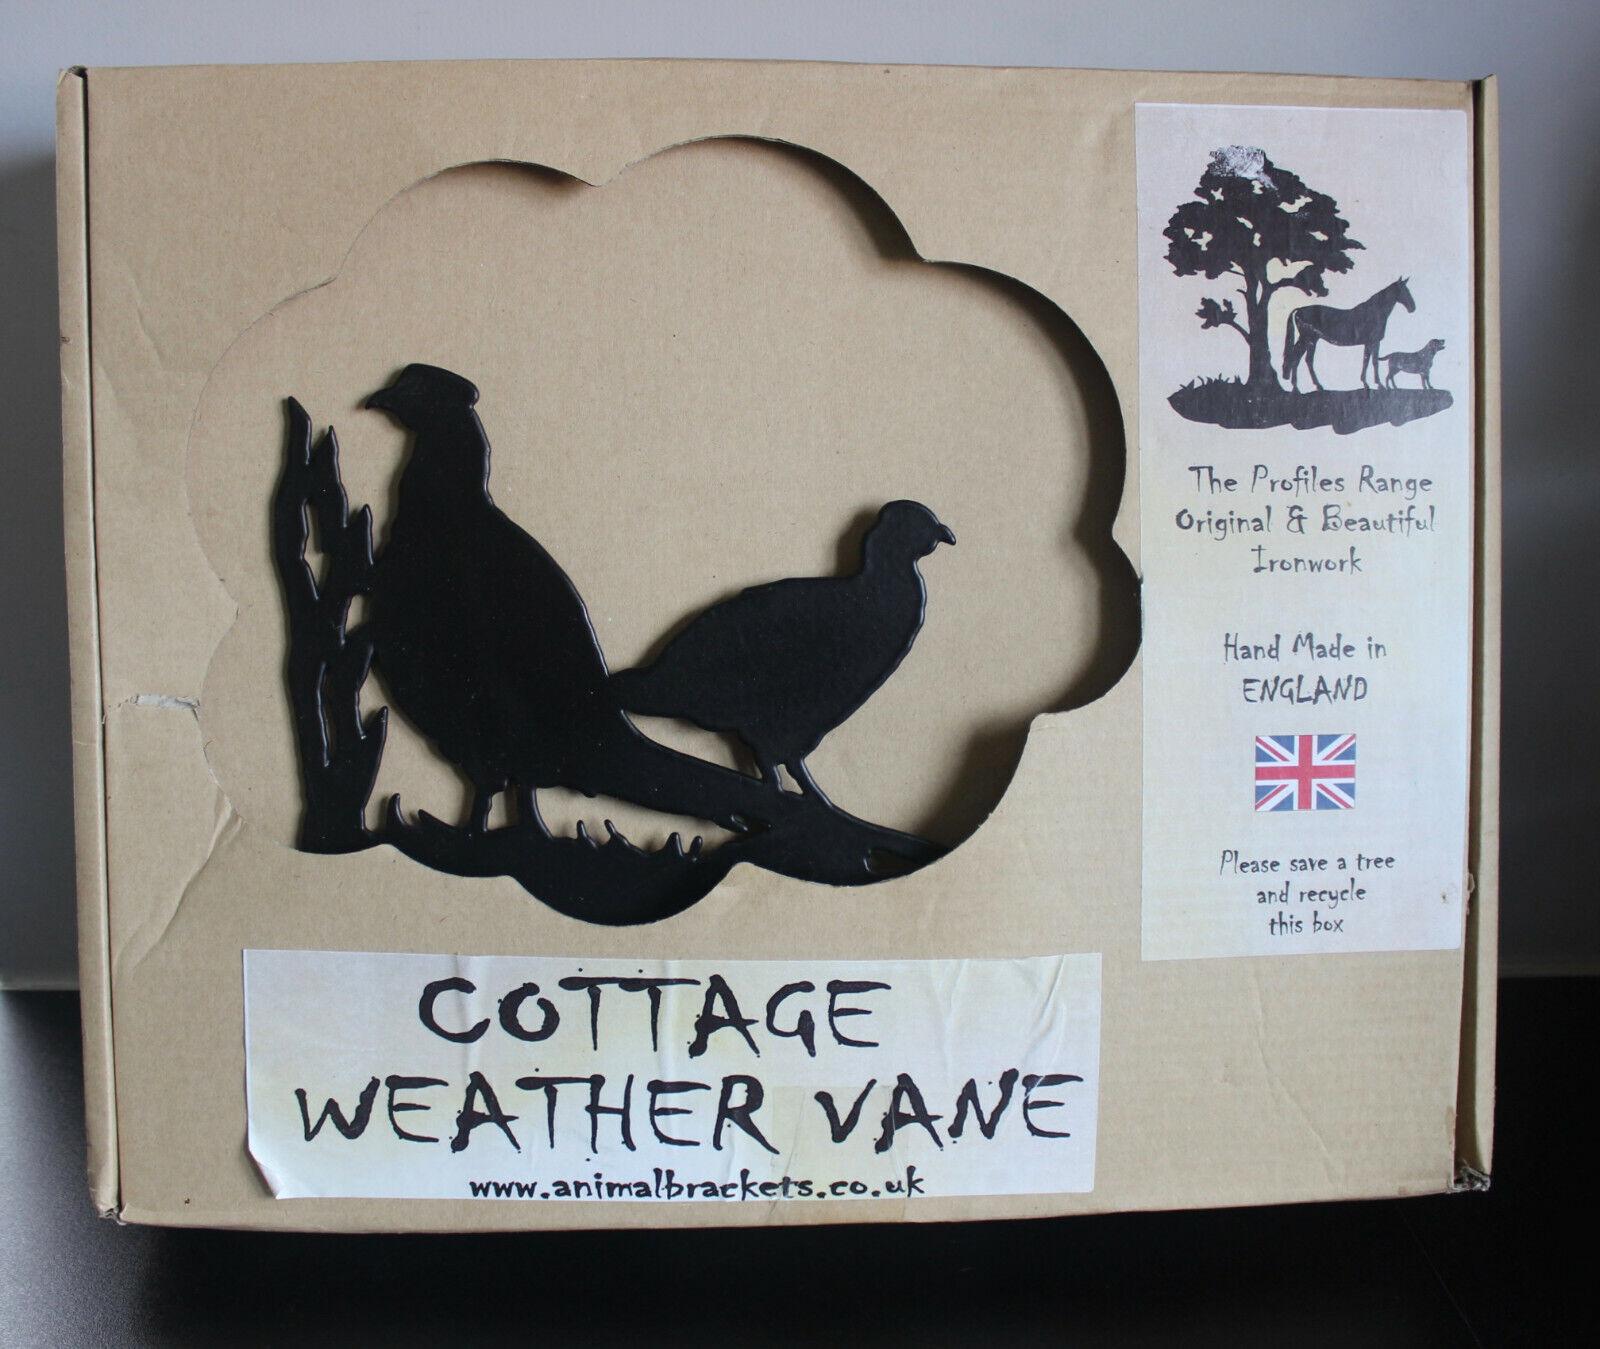 BNIB - British Made - Animal Brackets Cottage Weather Vane - Pheasants - 51 x 51